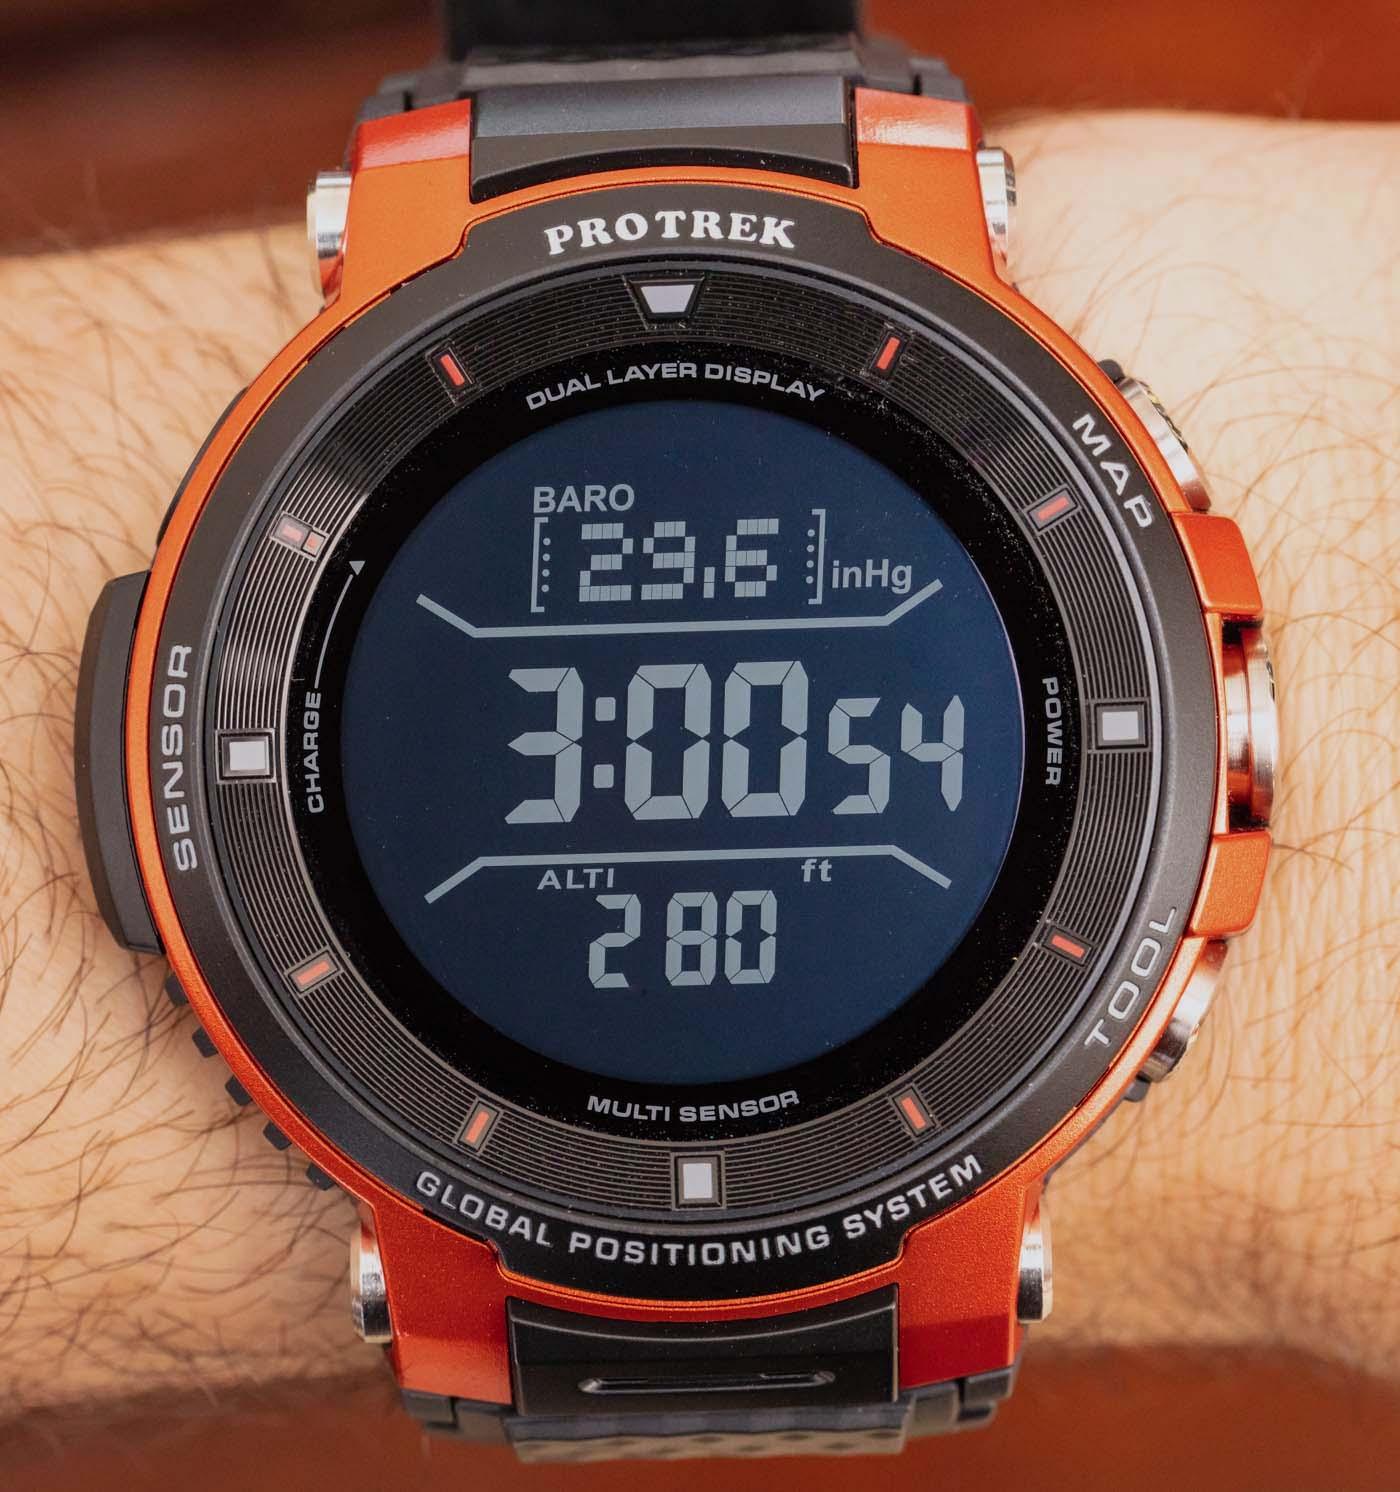 Casio Pro Trek Smart WSD-F30 Smartwatch Review | aBlogtoWatch